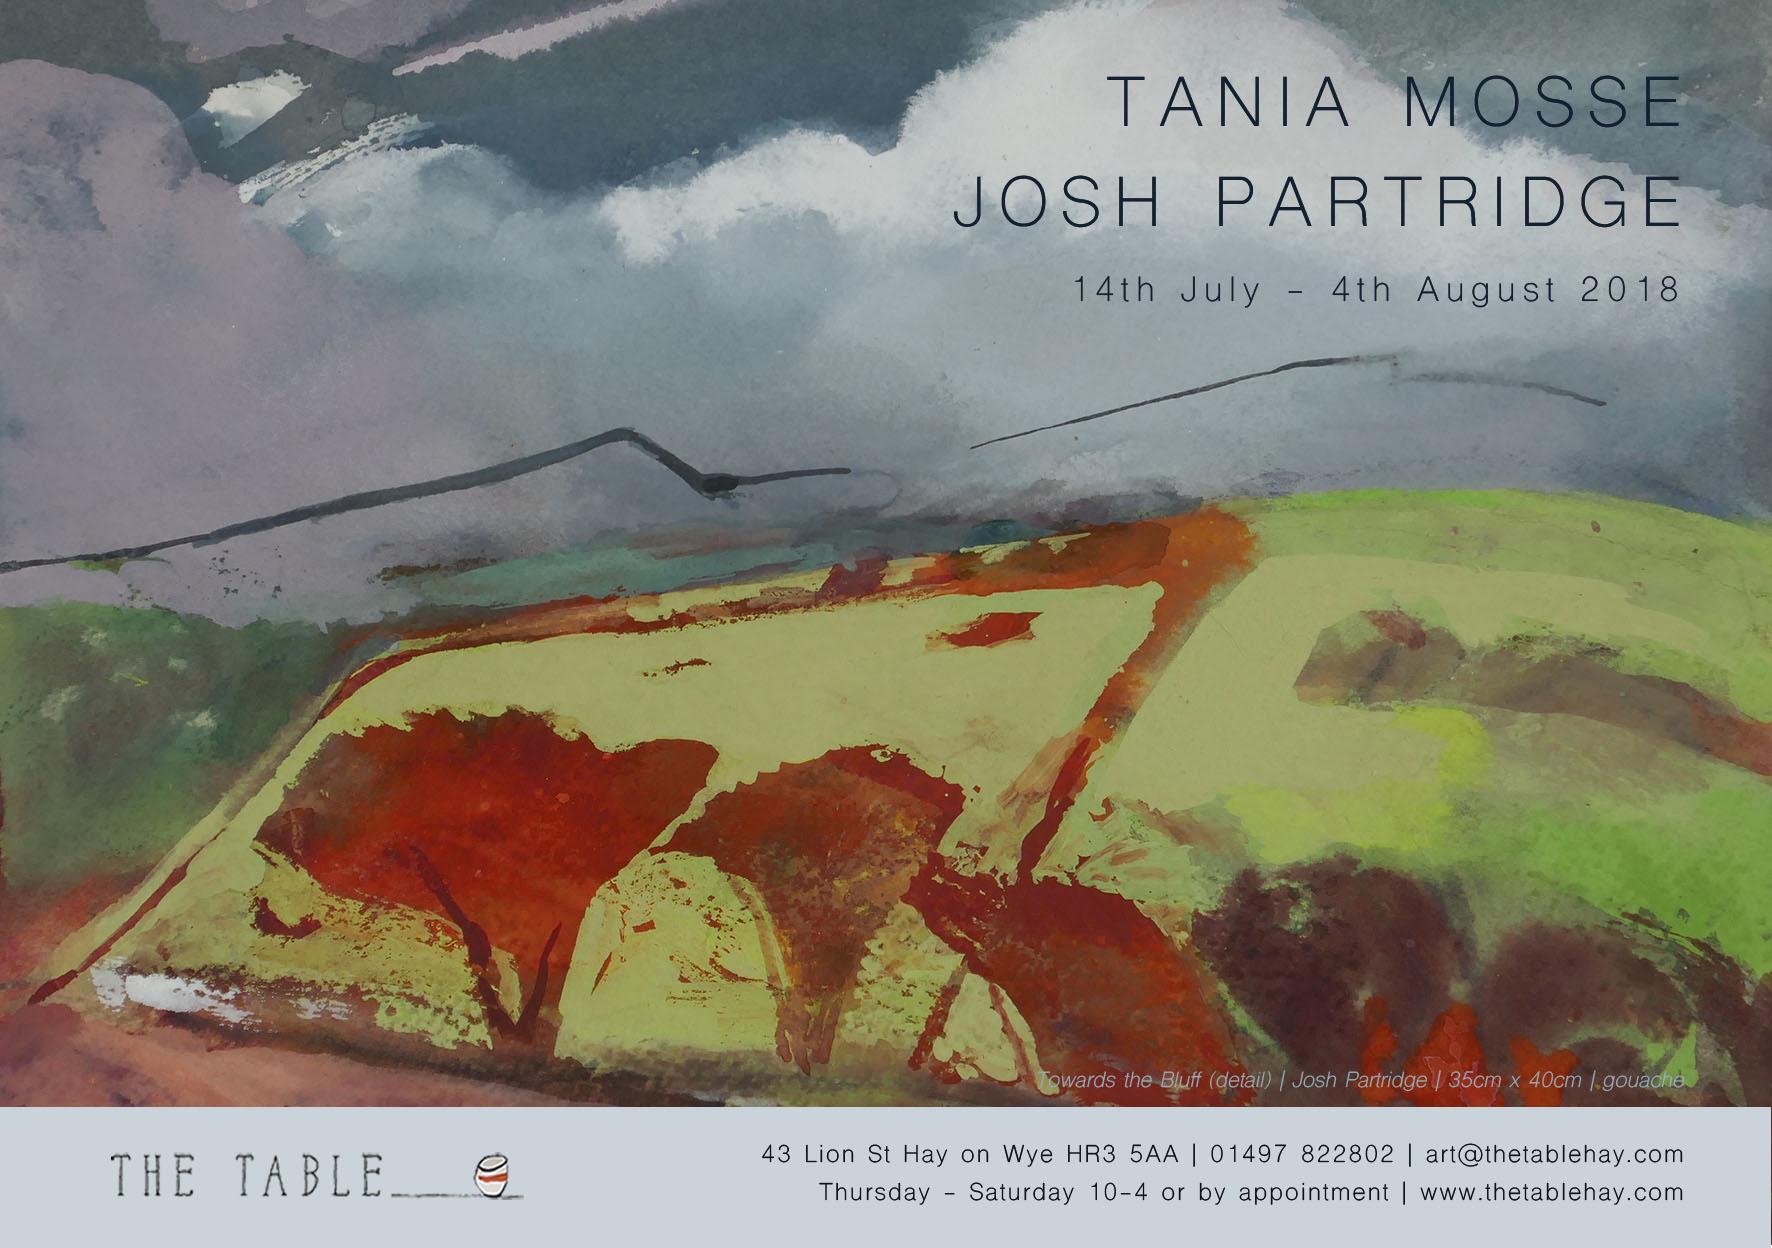 18-07-03 Tania Mosse.jpg